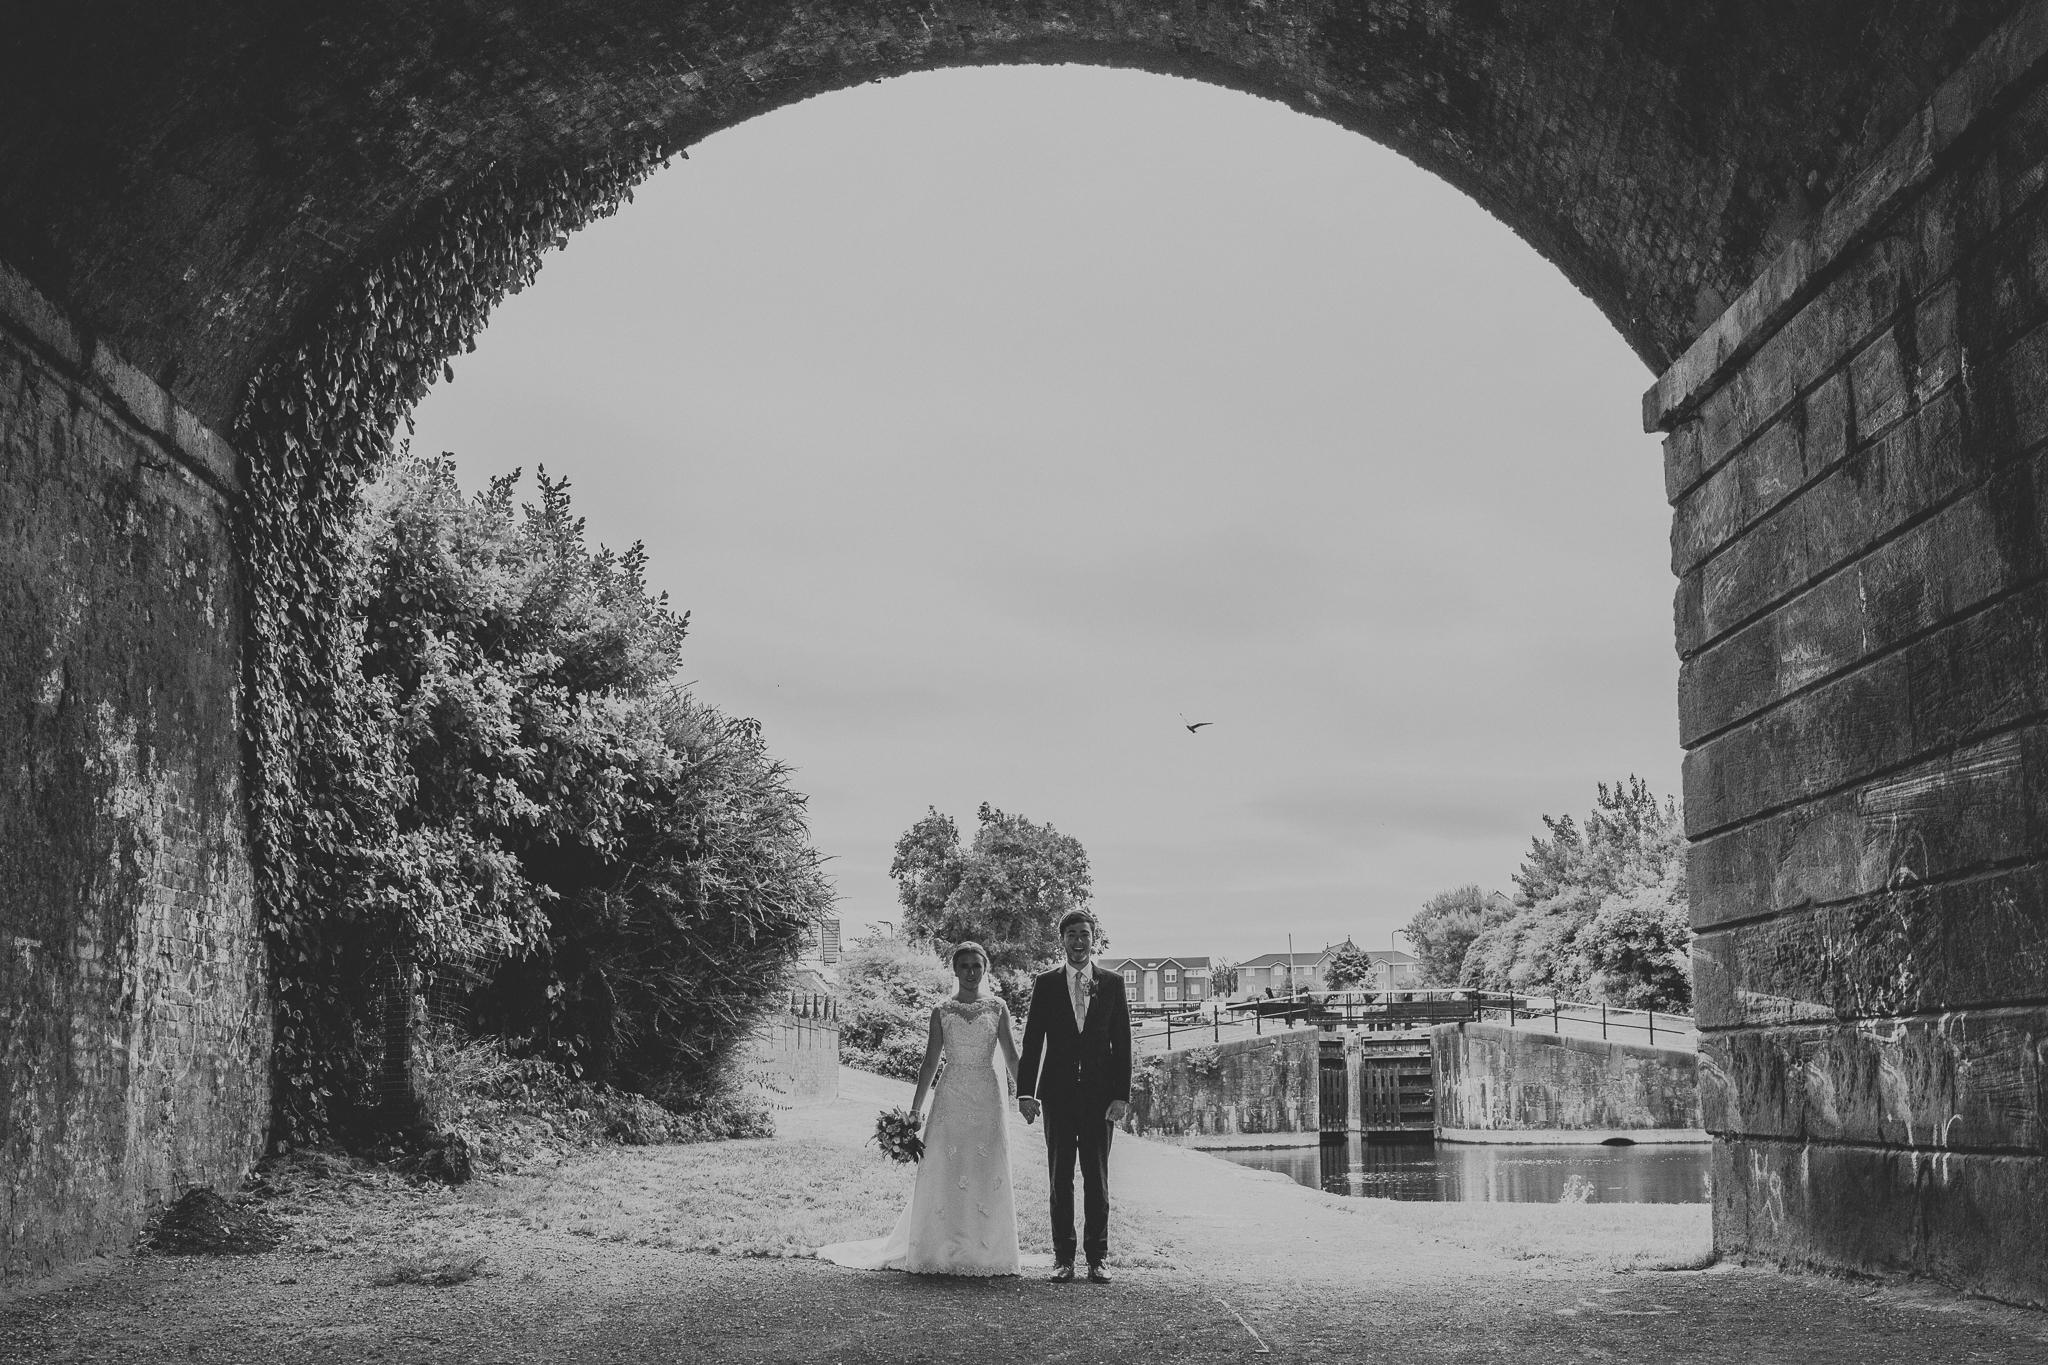 Jess and Ben - Liverpool wedding - bride and groom under a bridge holding hands